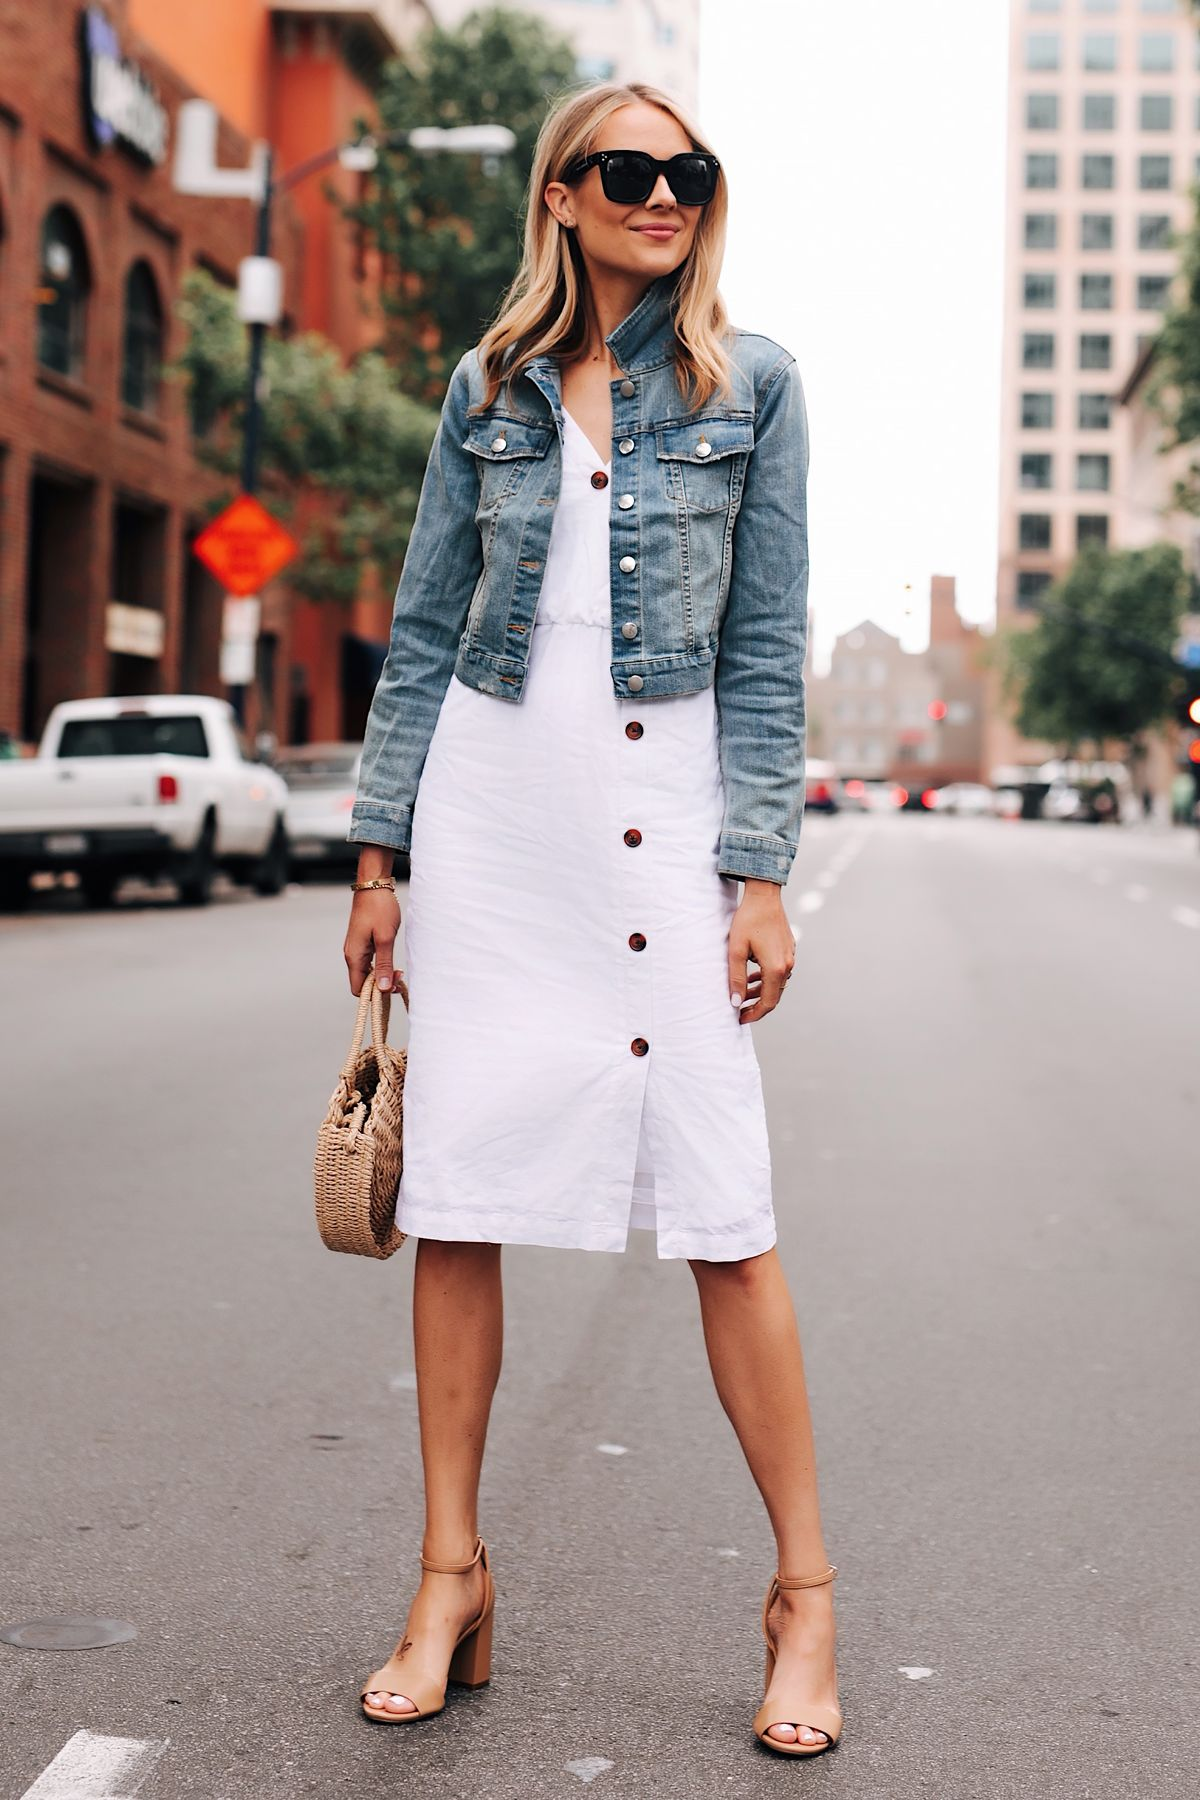 Fashion Jackson Wearing Denim Jacket White Midi Dress Tan Ankle Strap Heeled Sandals Fashion Jean Jacket Outfits Fashion Jackson [ 1800 x 1200 Pixel ]